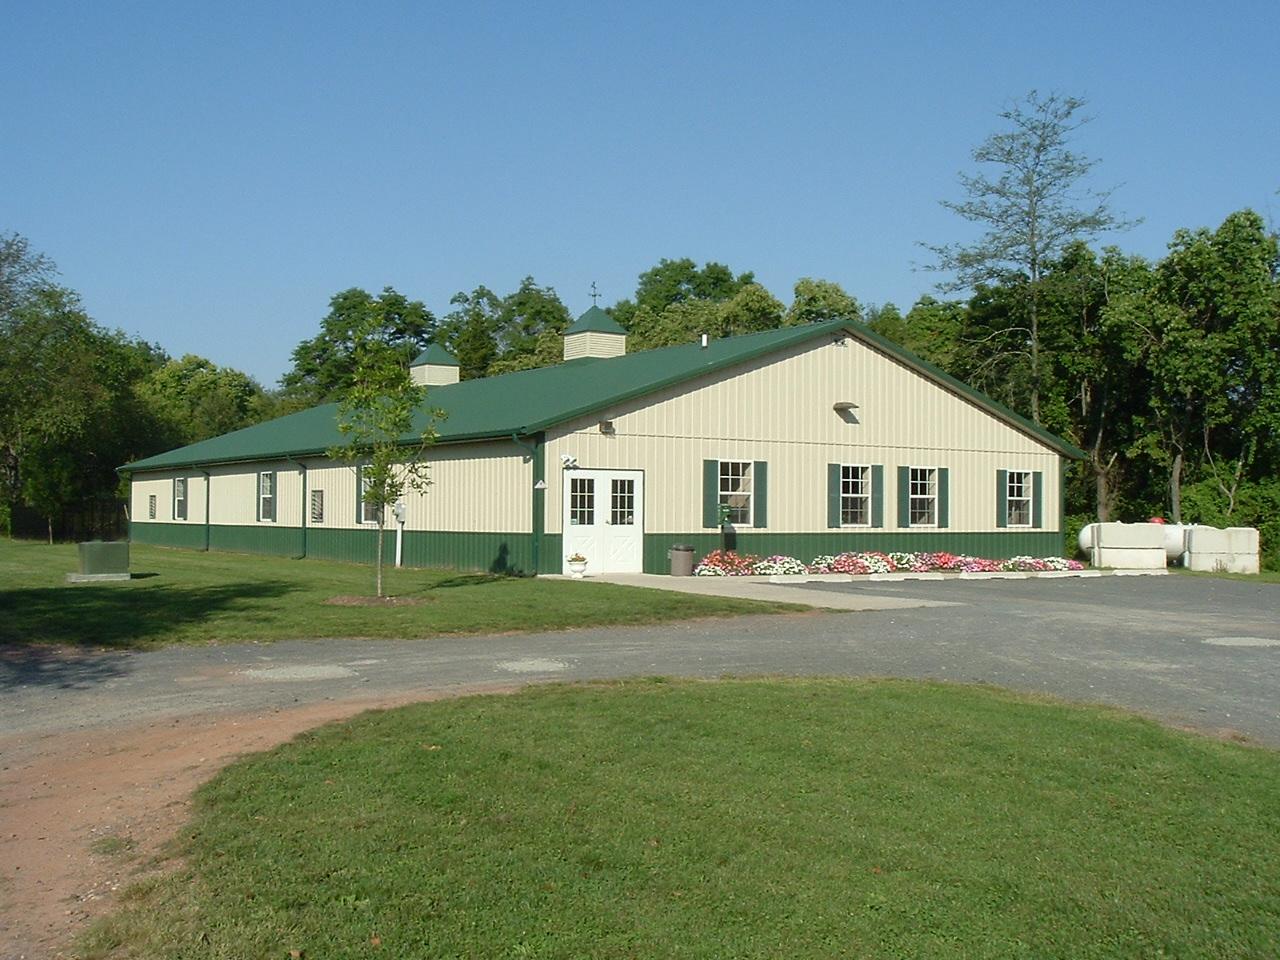 The Ruff House